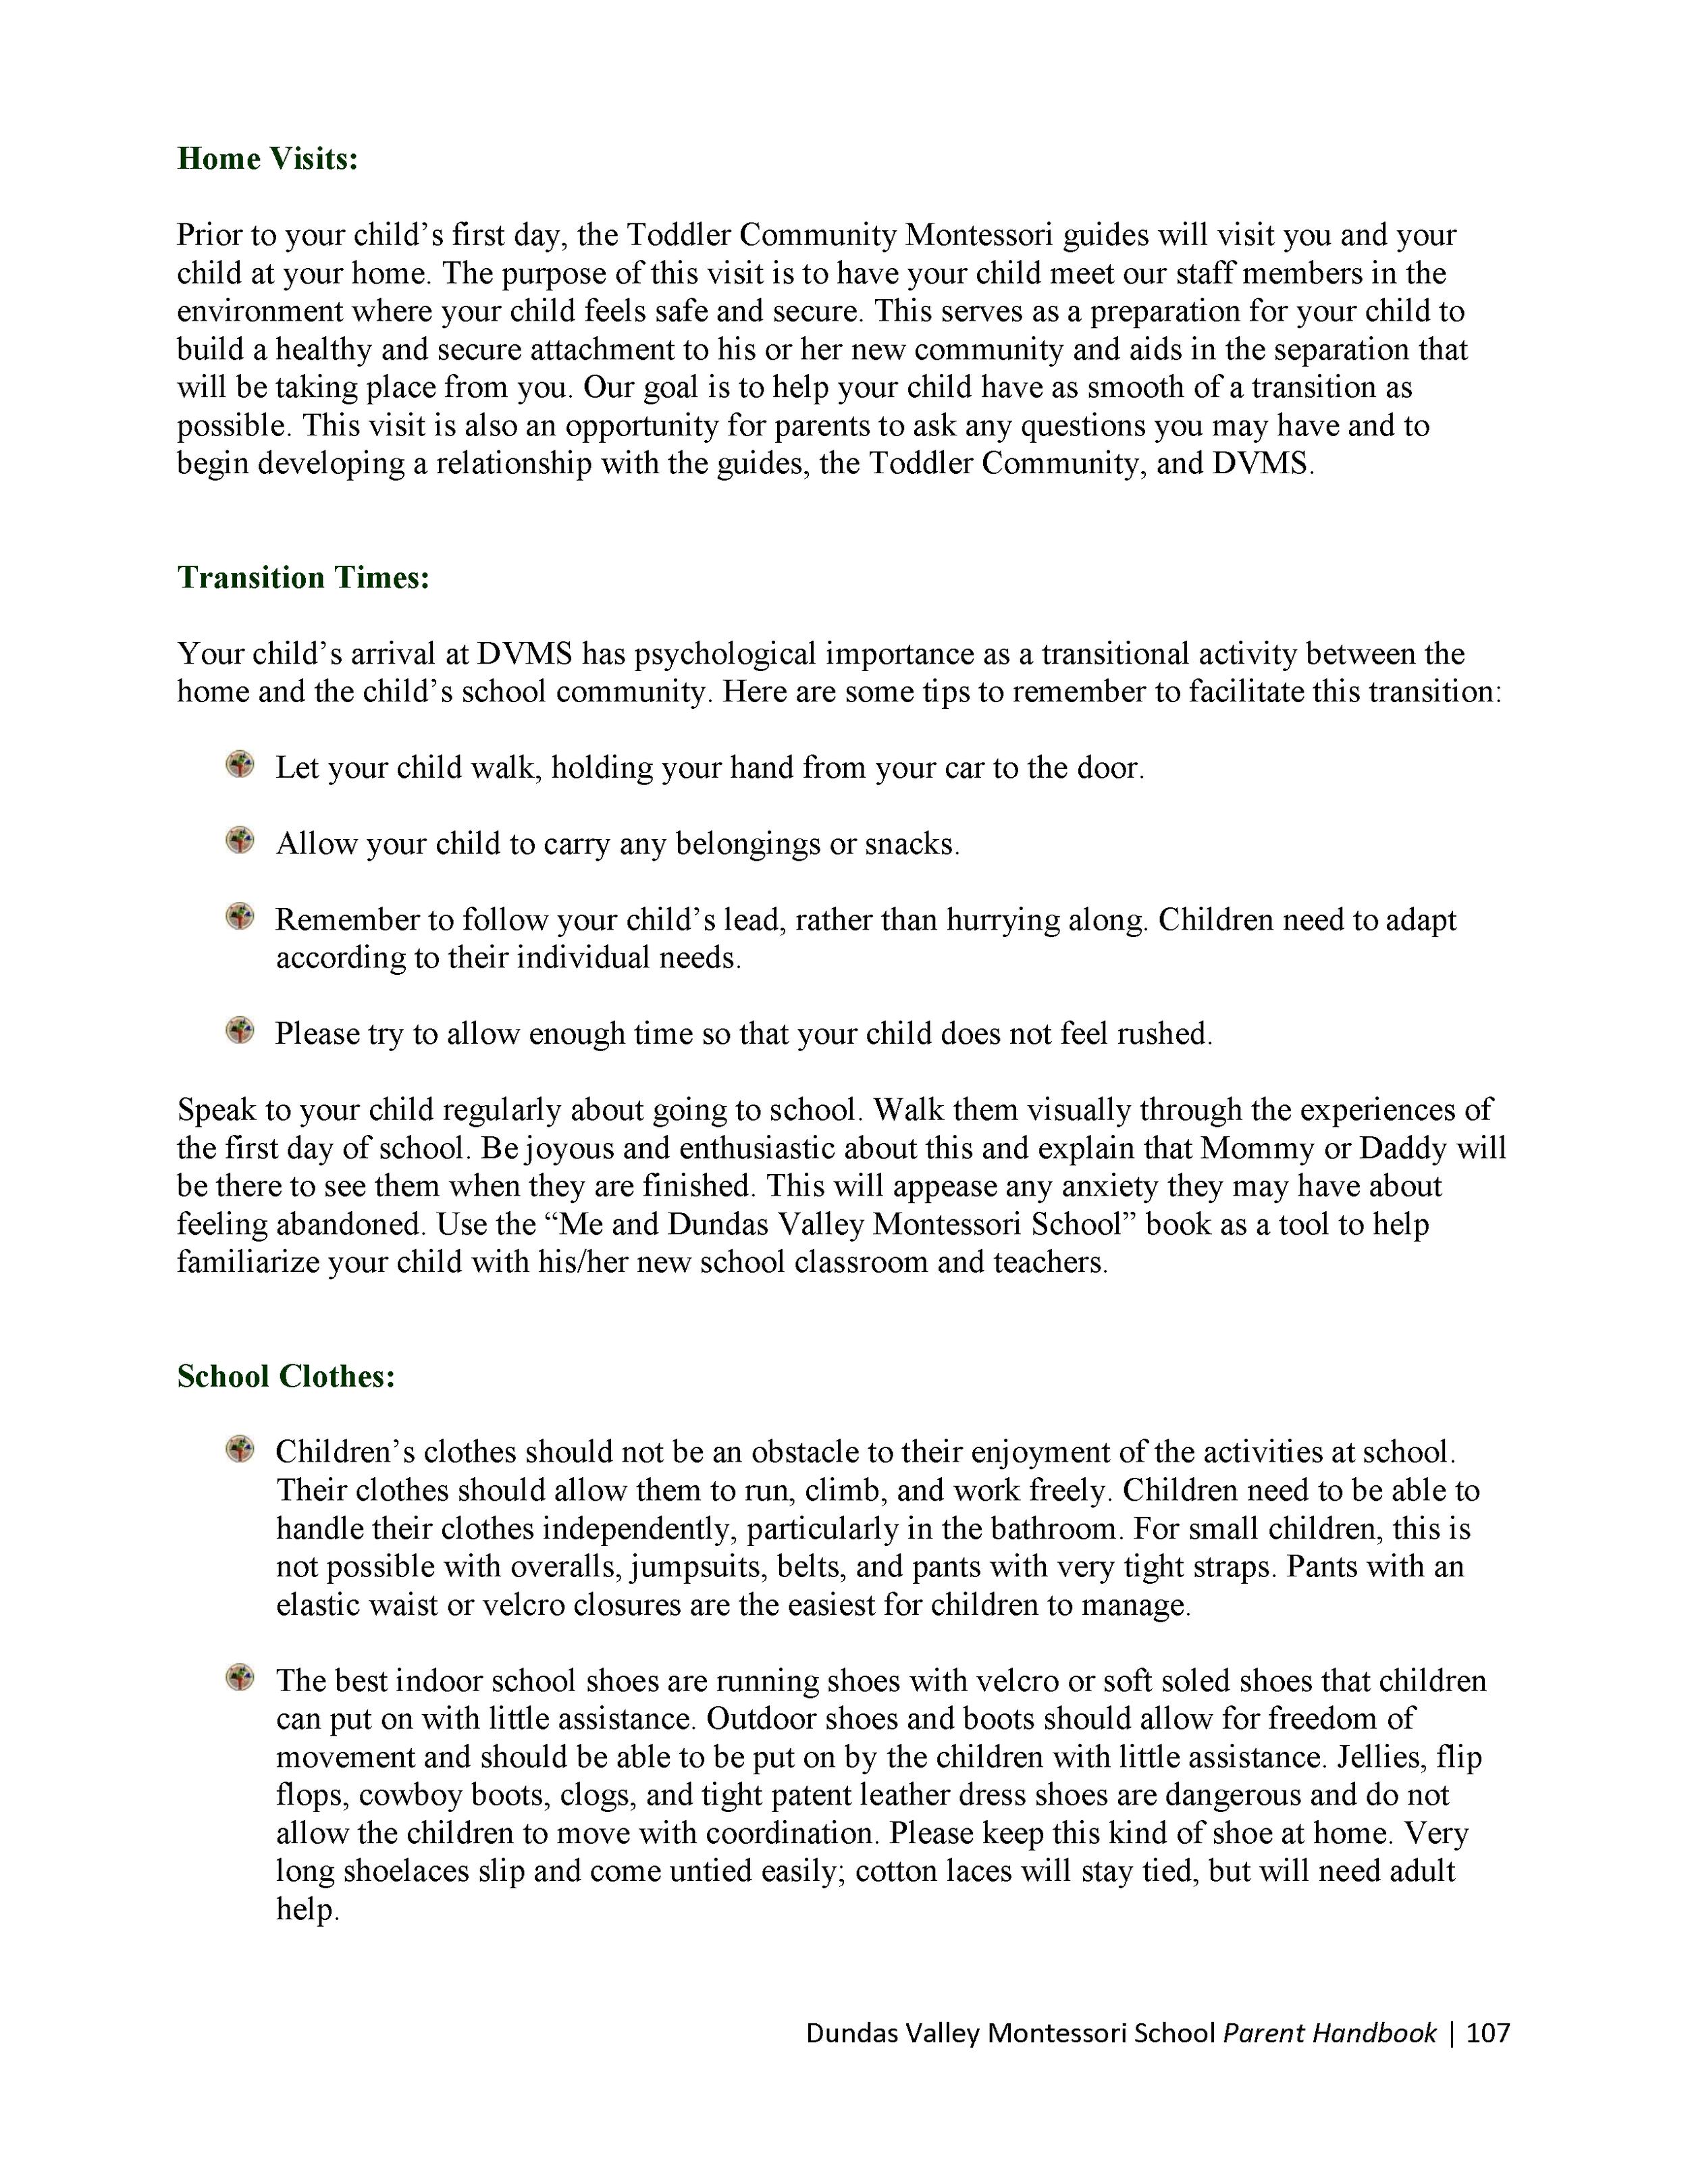 DVMS-Parent-Handbook-19-20_Page_109.png